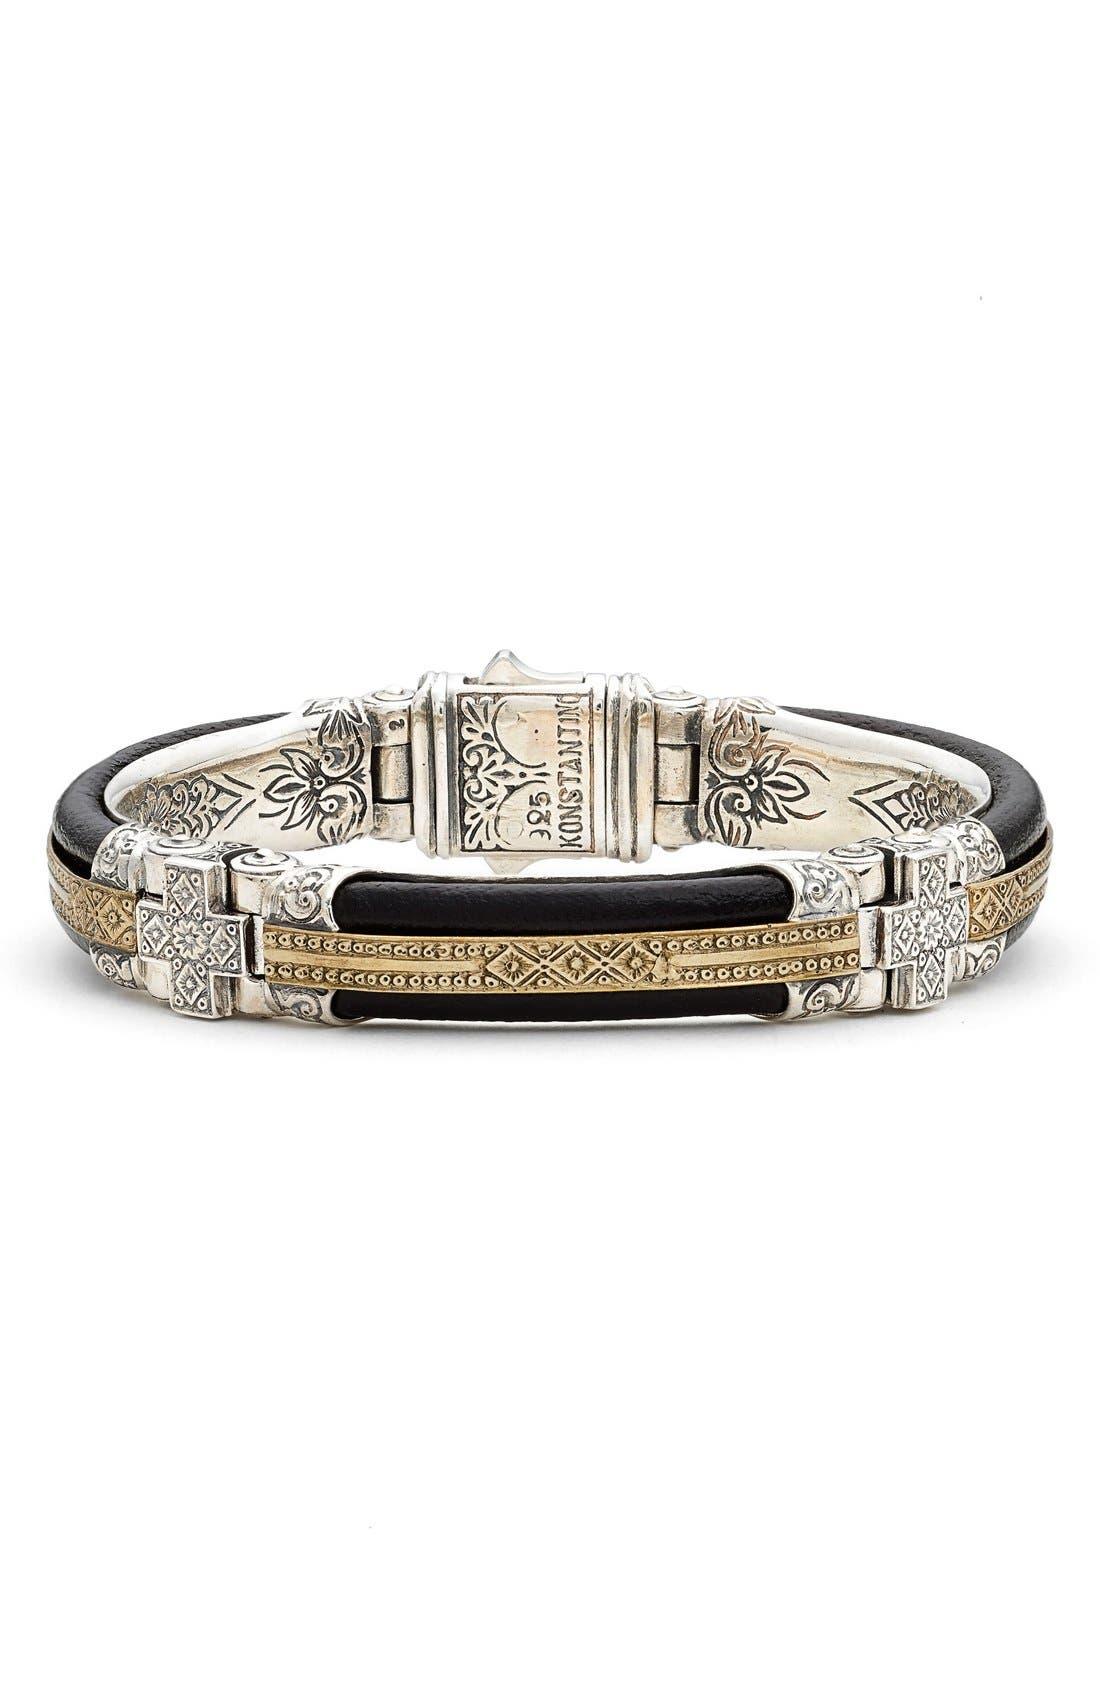 Alternate Image 1 Selected - Konstantino Byzantium Etched Sterling Silver Bracelet